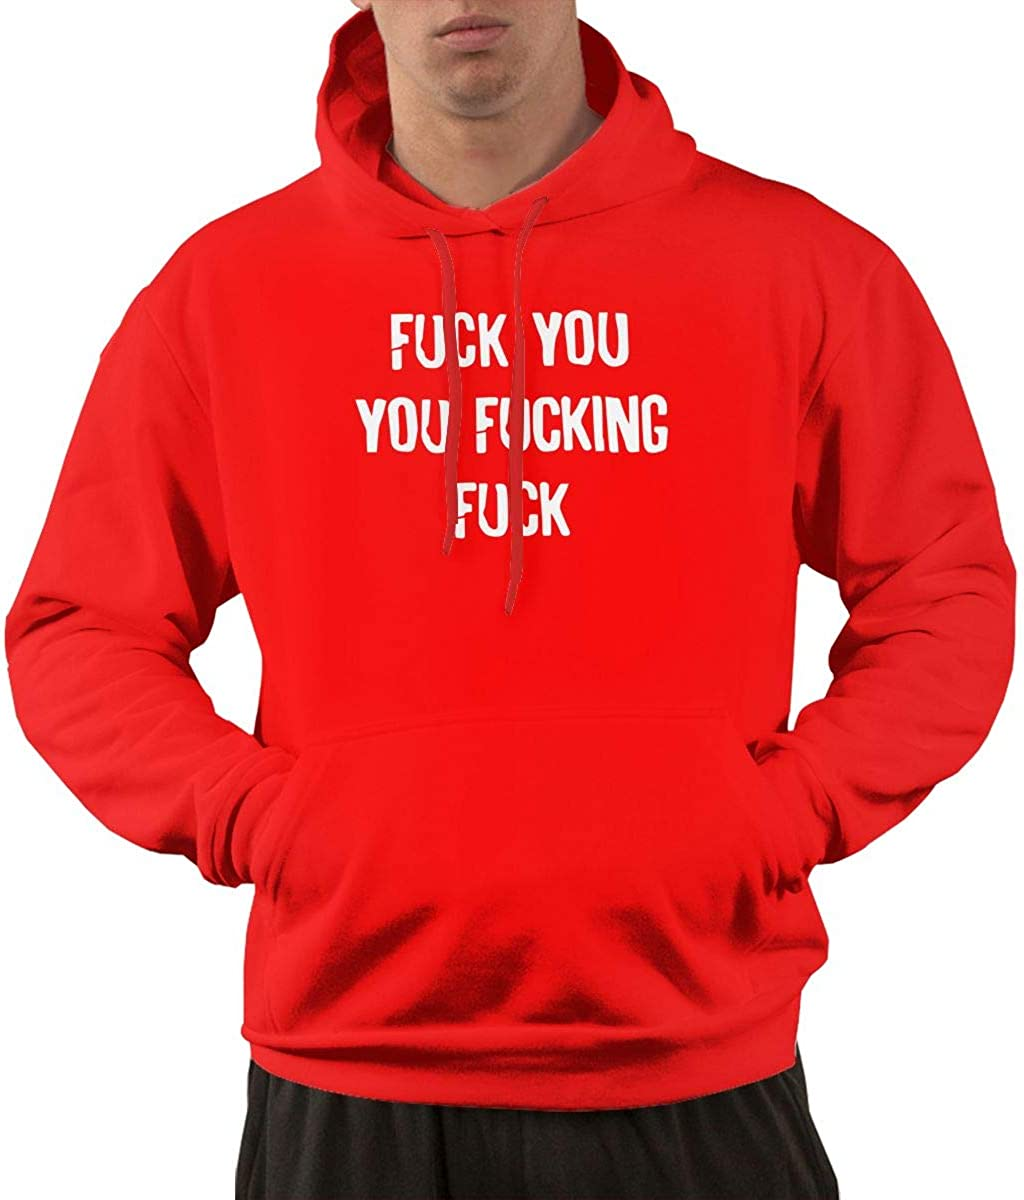 JLPOU-6 Mens Fuck You You Fucking Fuck Pullover Hoodie Sweatshirt with Kangaroo Pocket